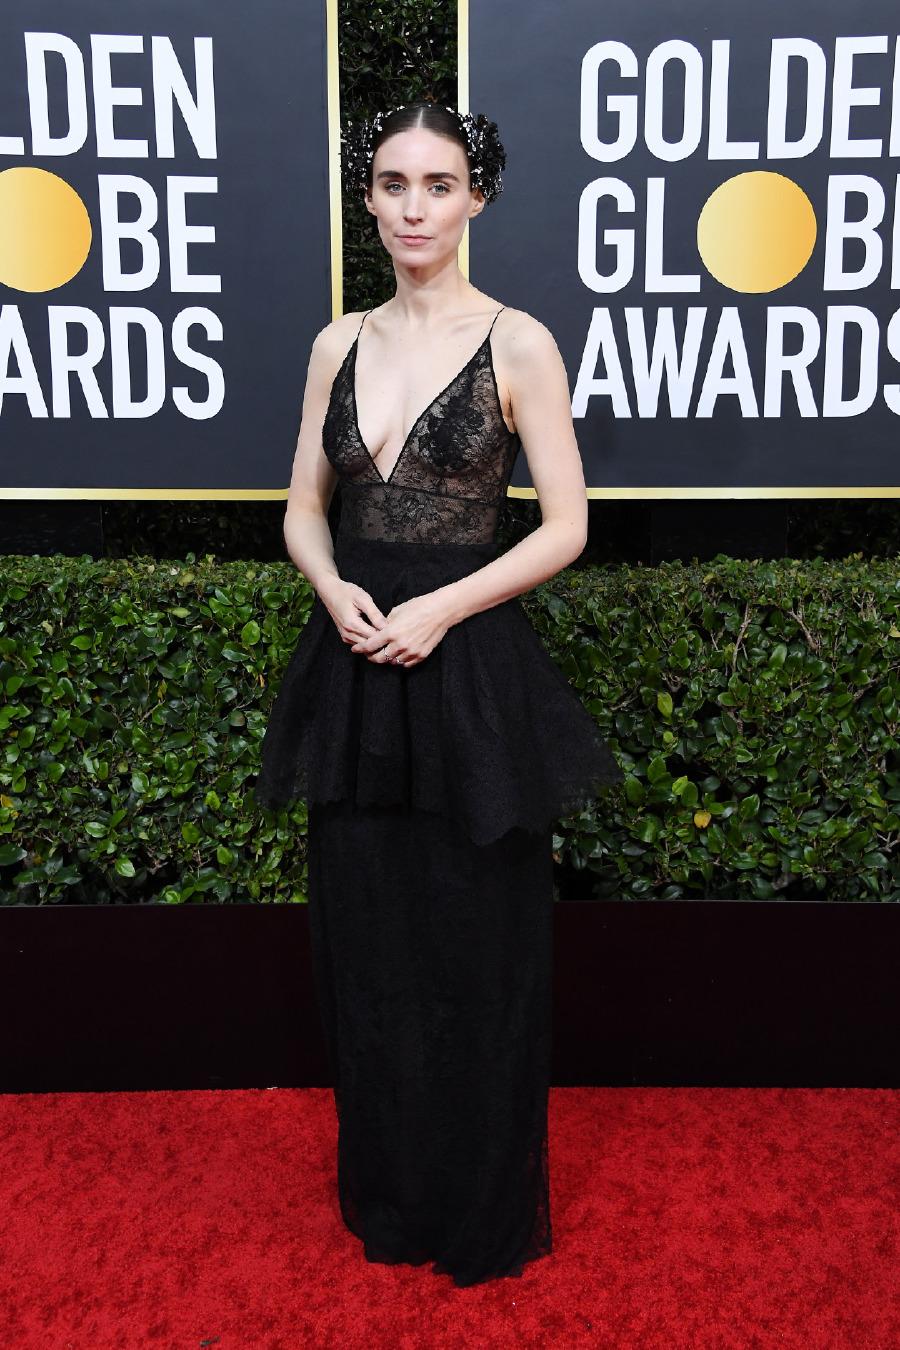 Rooney Mara, Elbise: Givenchy